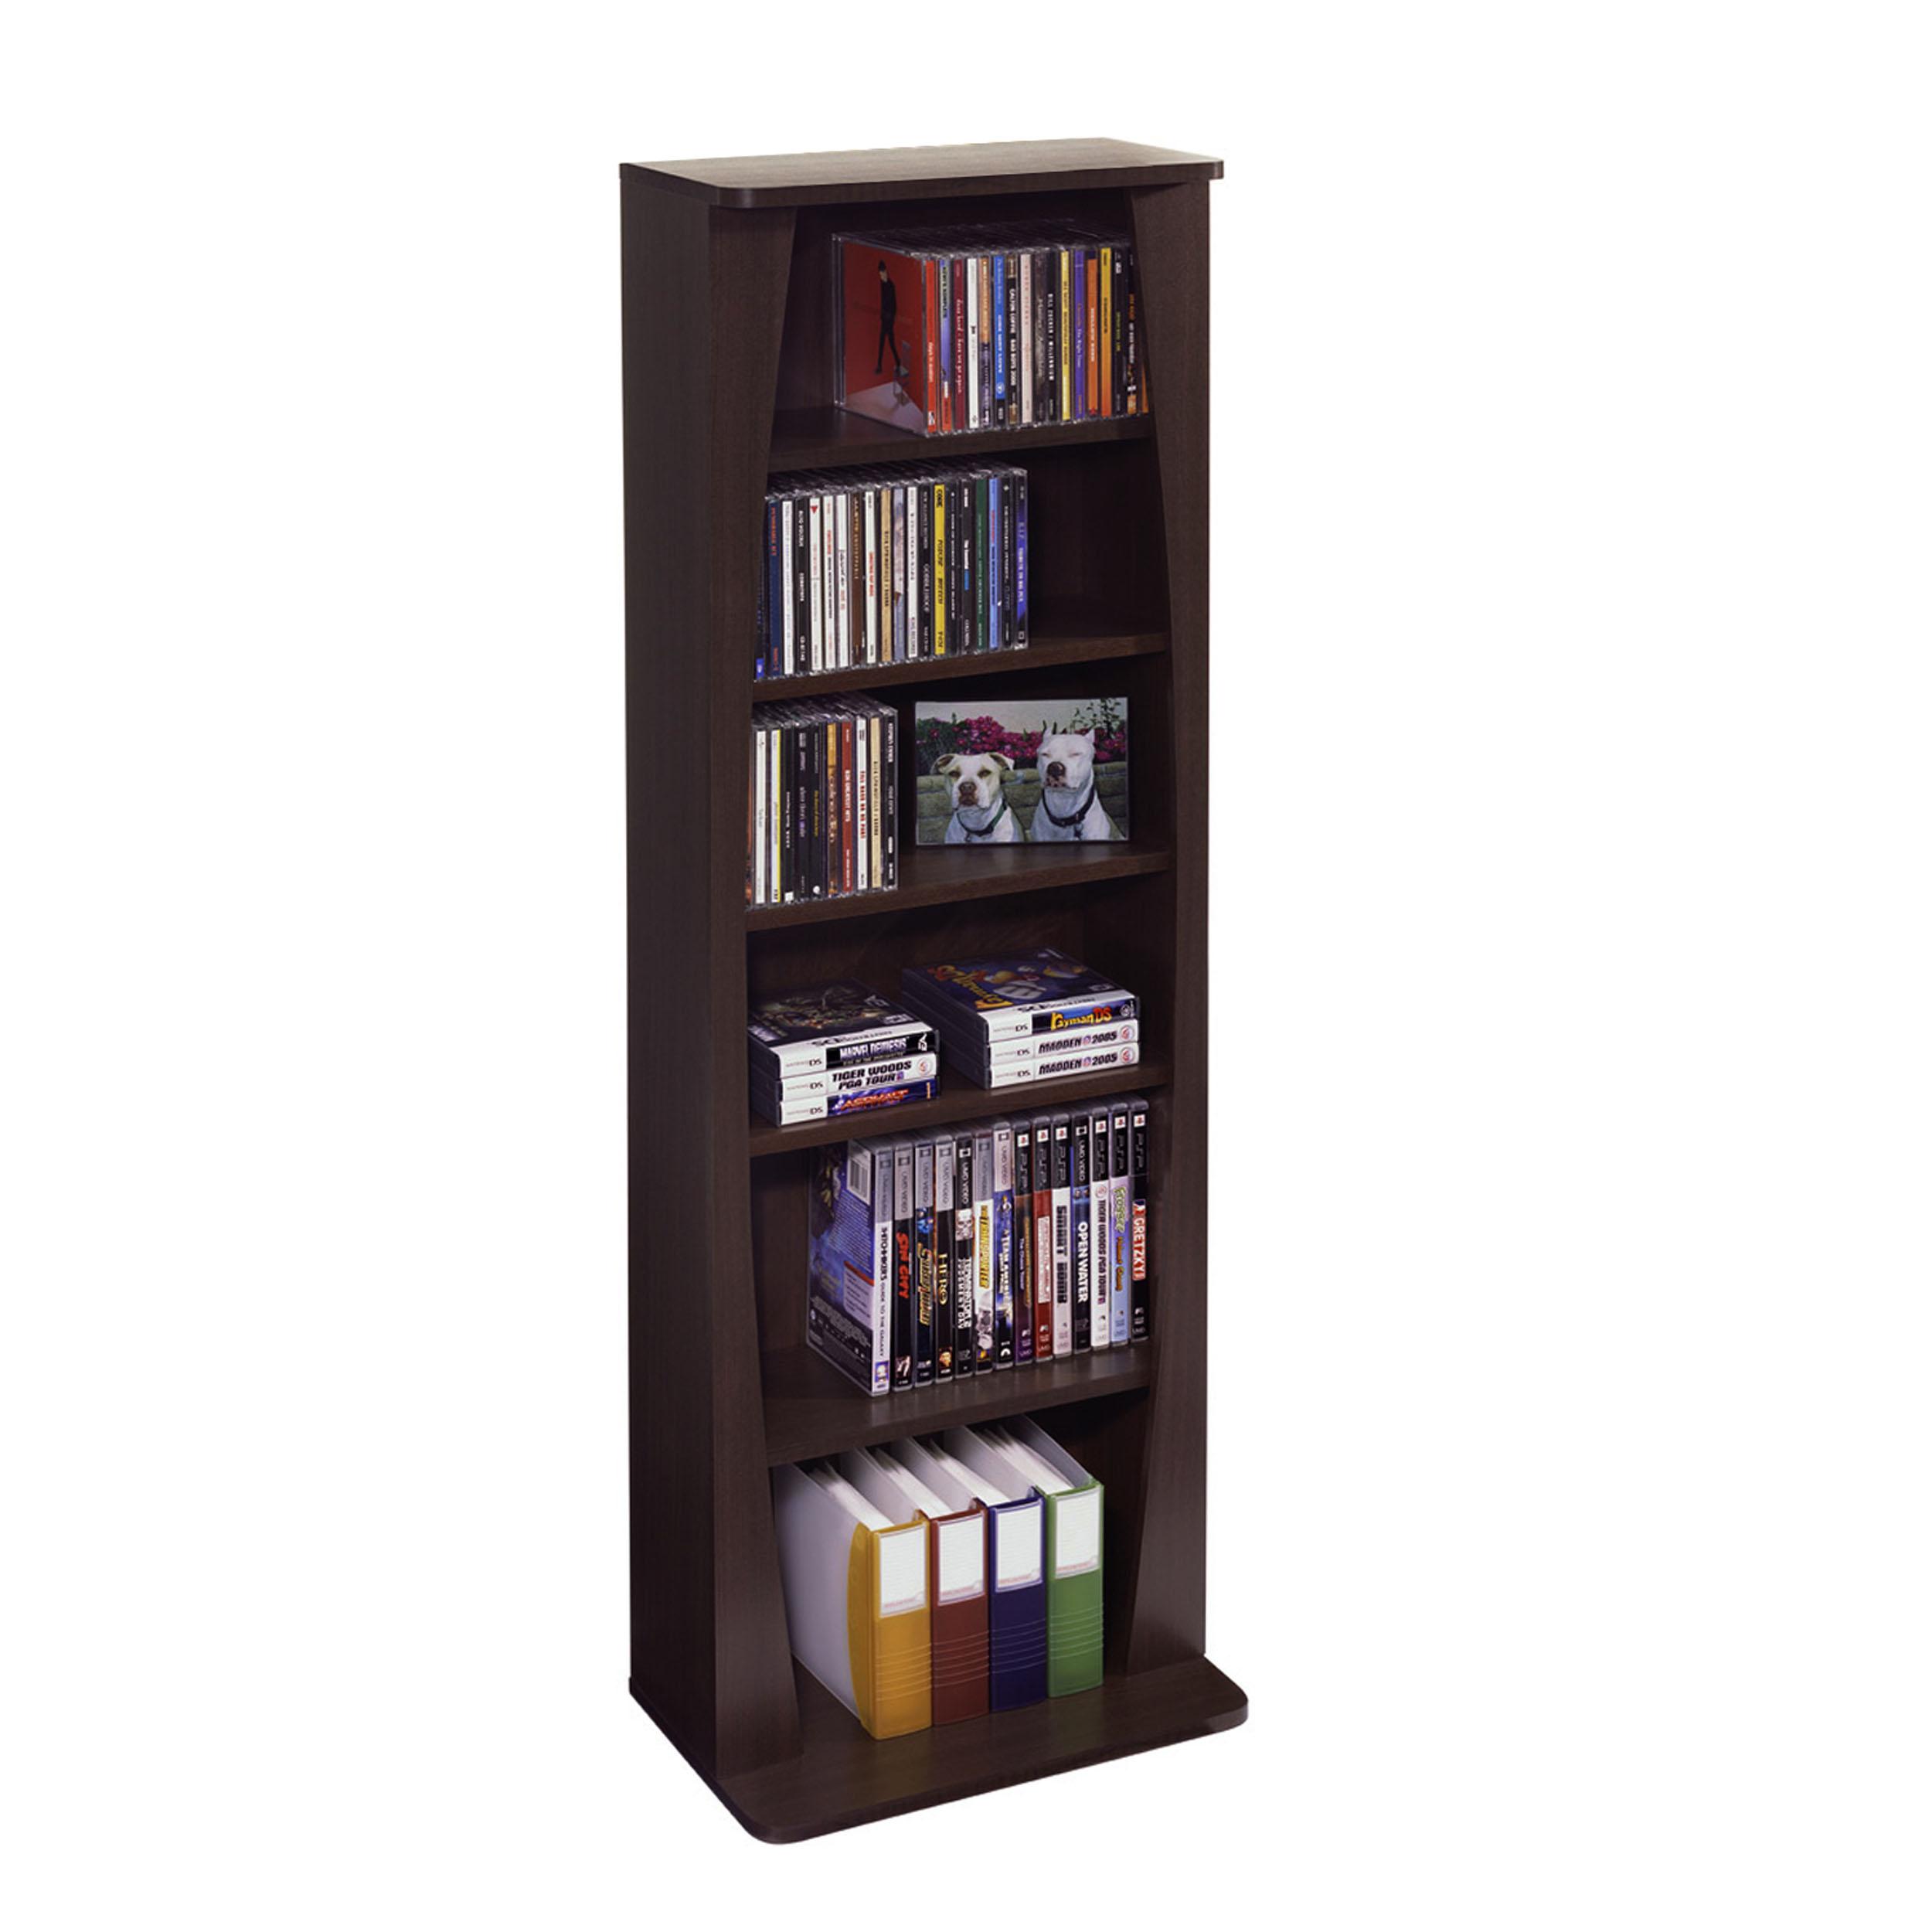 Atlantic 43 Canoe Multimedia Bookcase Storage Shelf 231 Cds 115 Dvds 140 Blurays Walmart Com